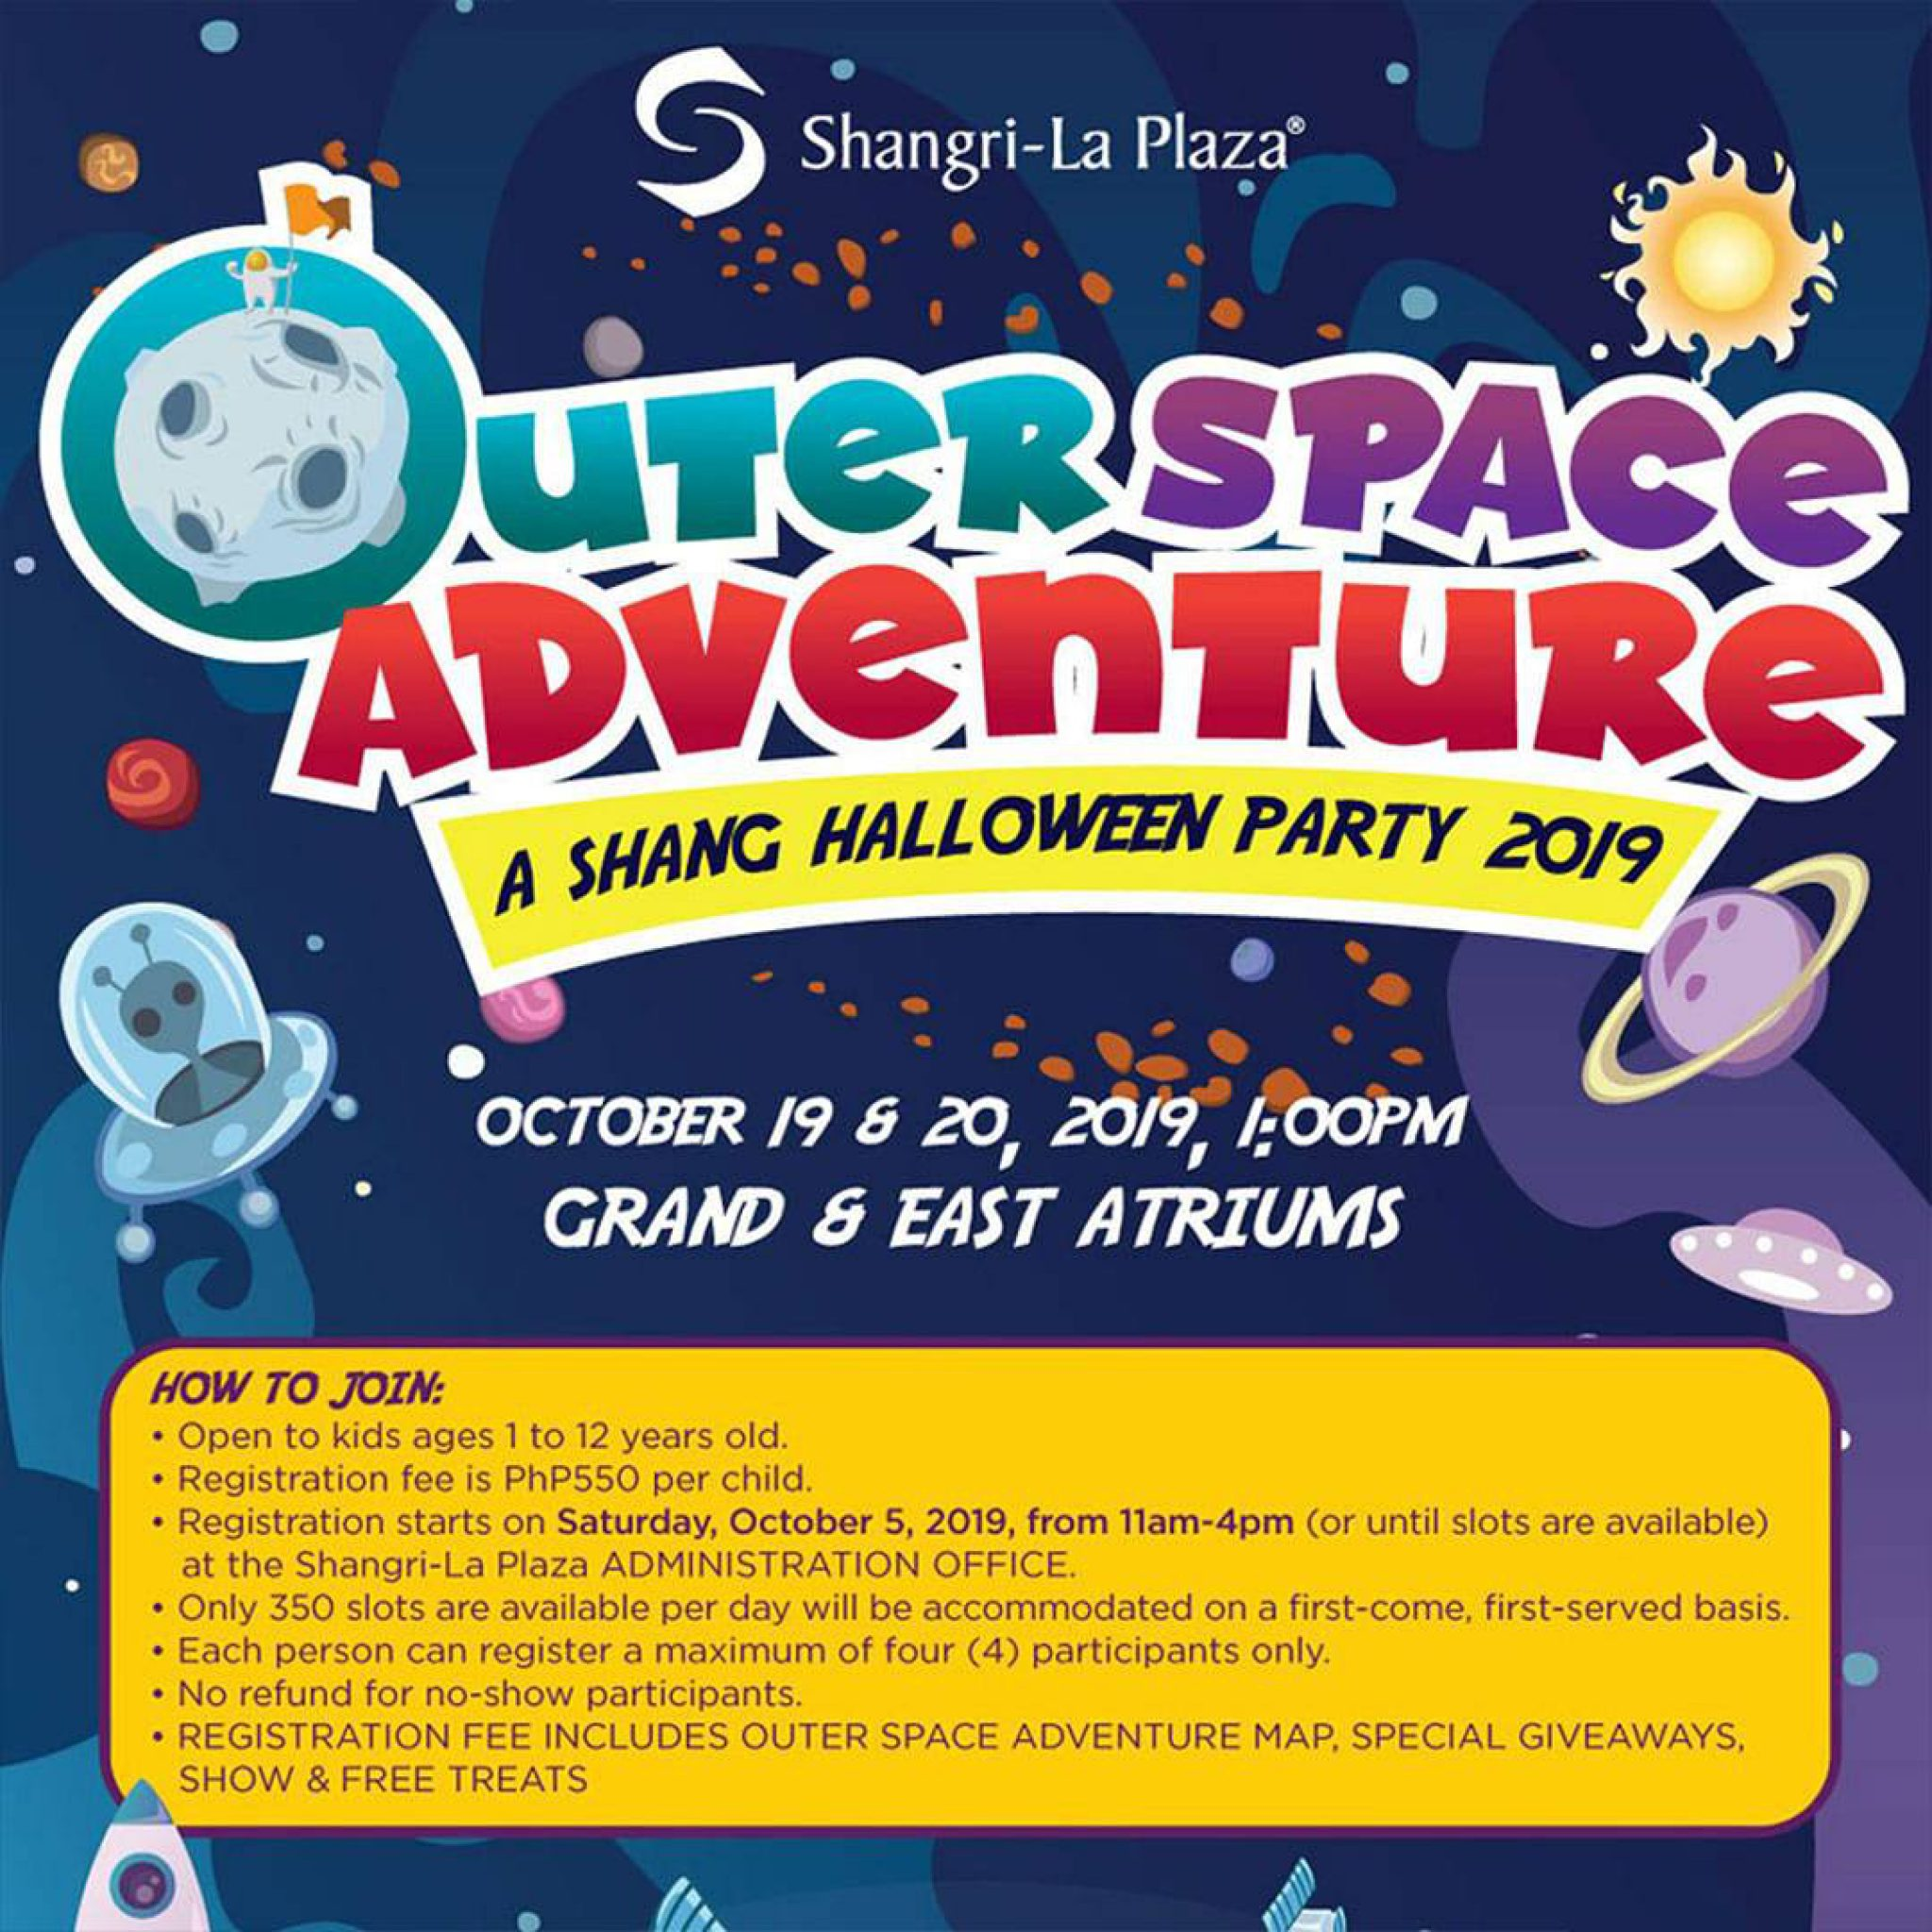 Shangri-La Plaza: Outer Space Adventure